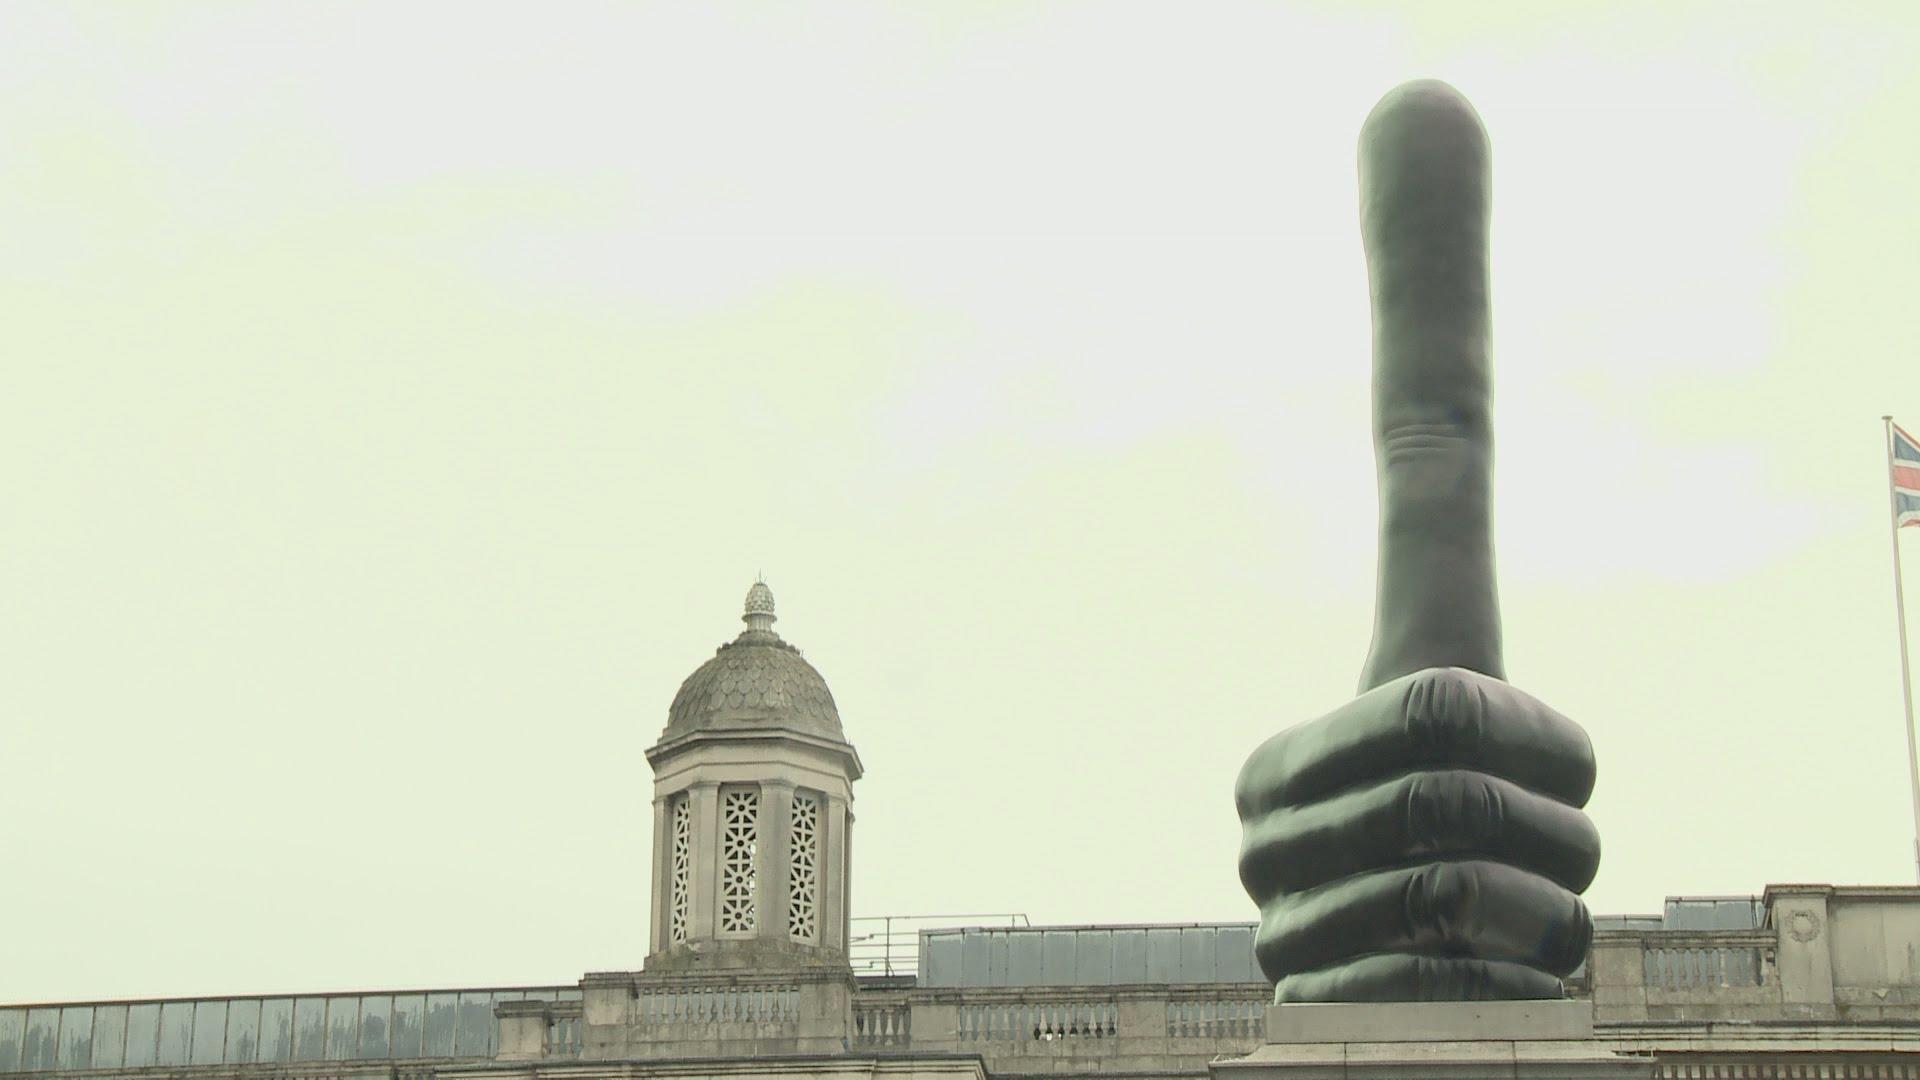 VIDEO: Četvrti postament na Trafalgar trgu dobio skulpturu